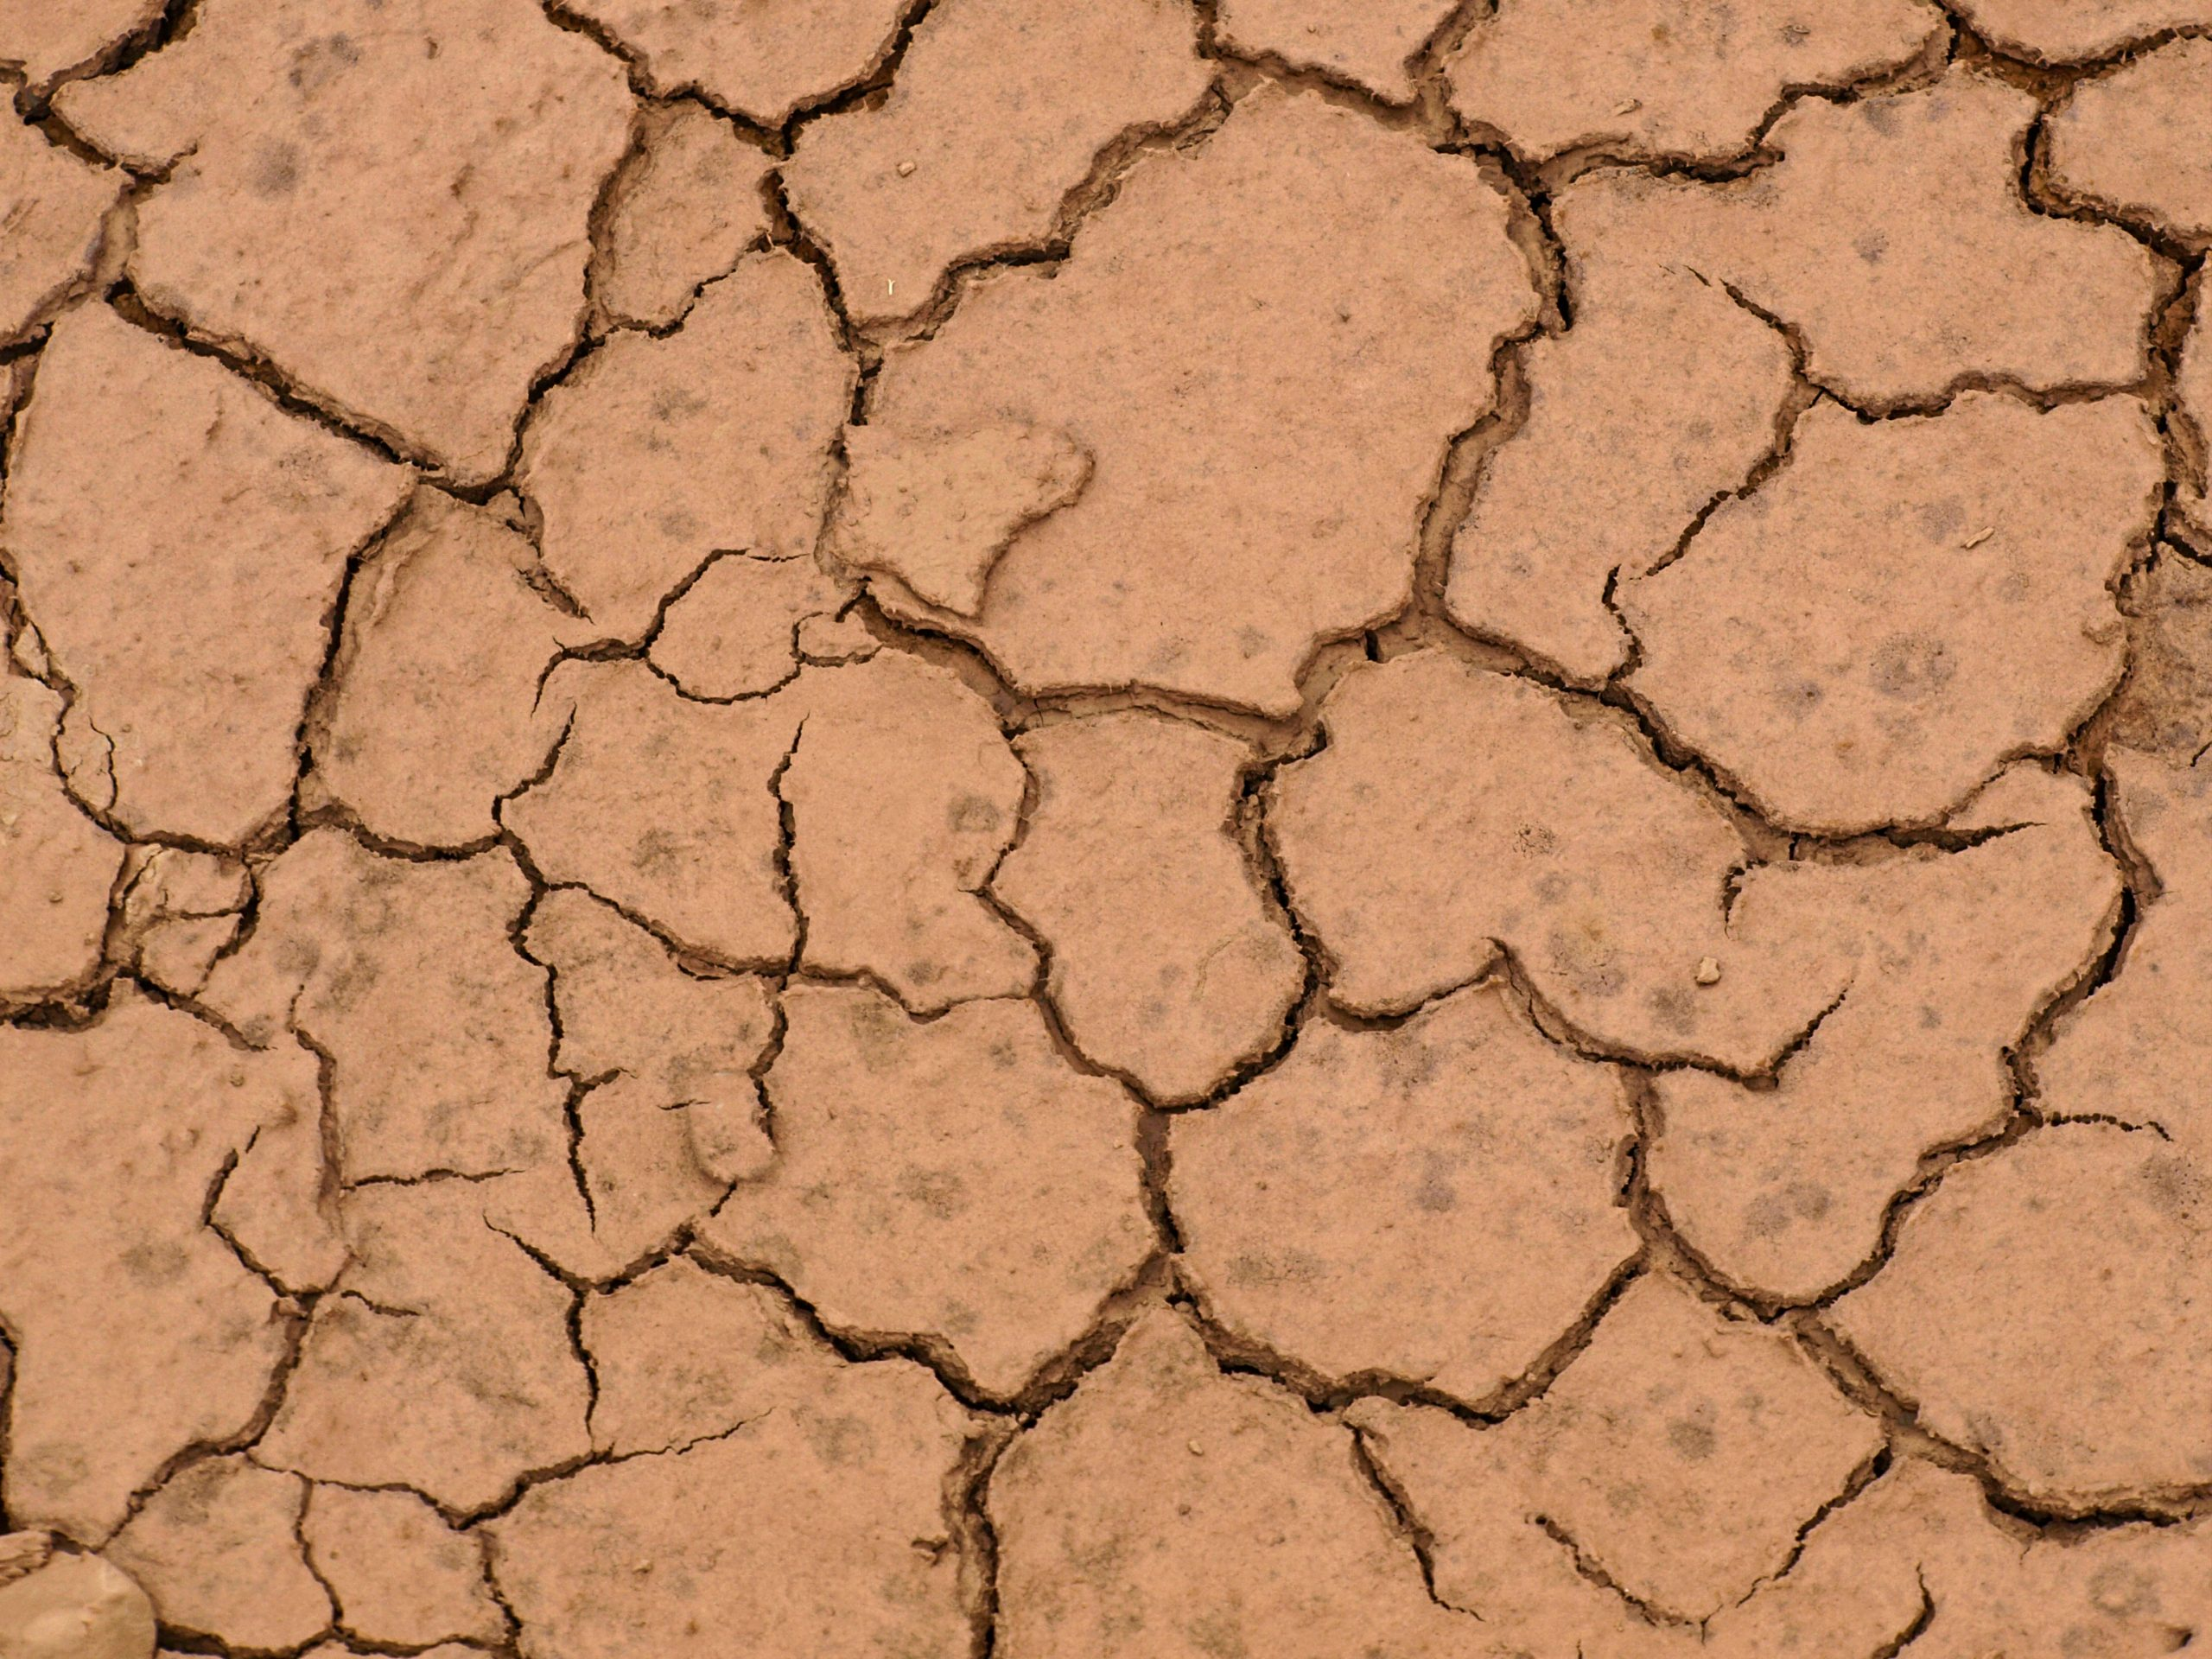 A dry land